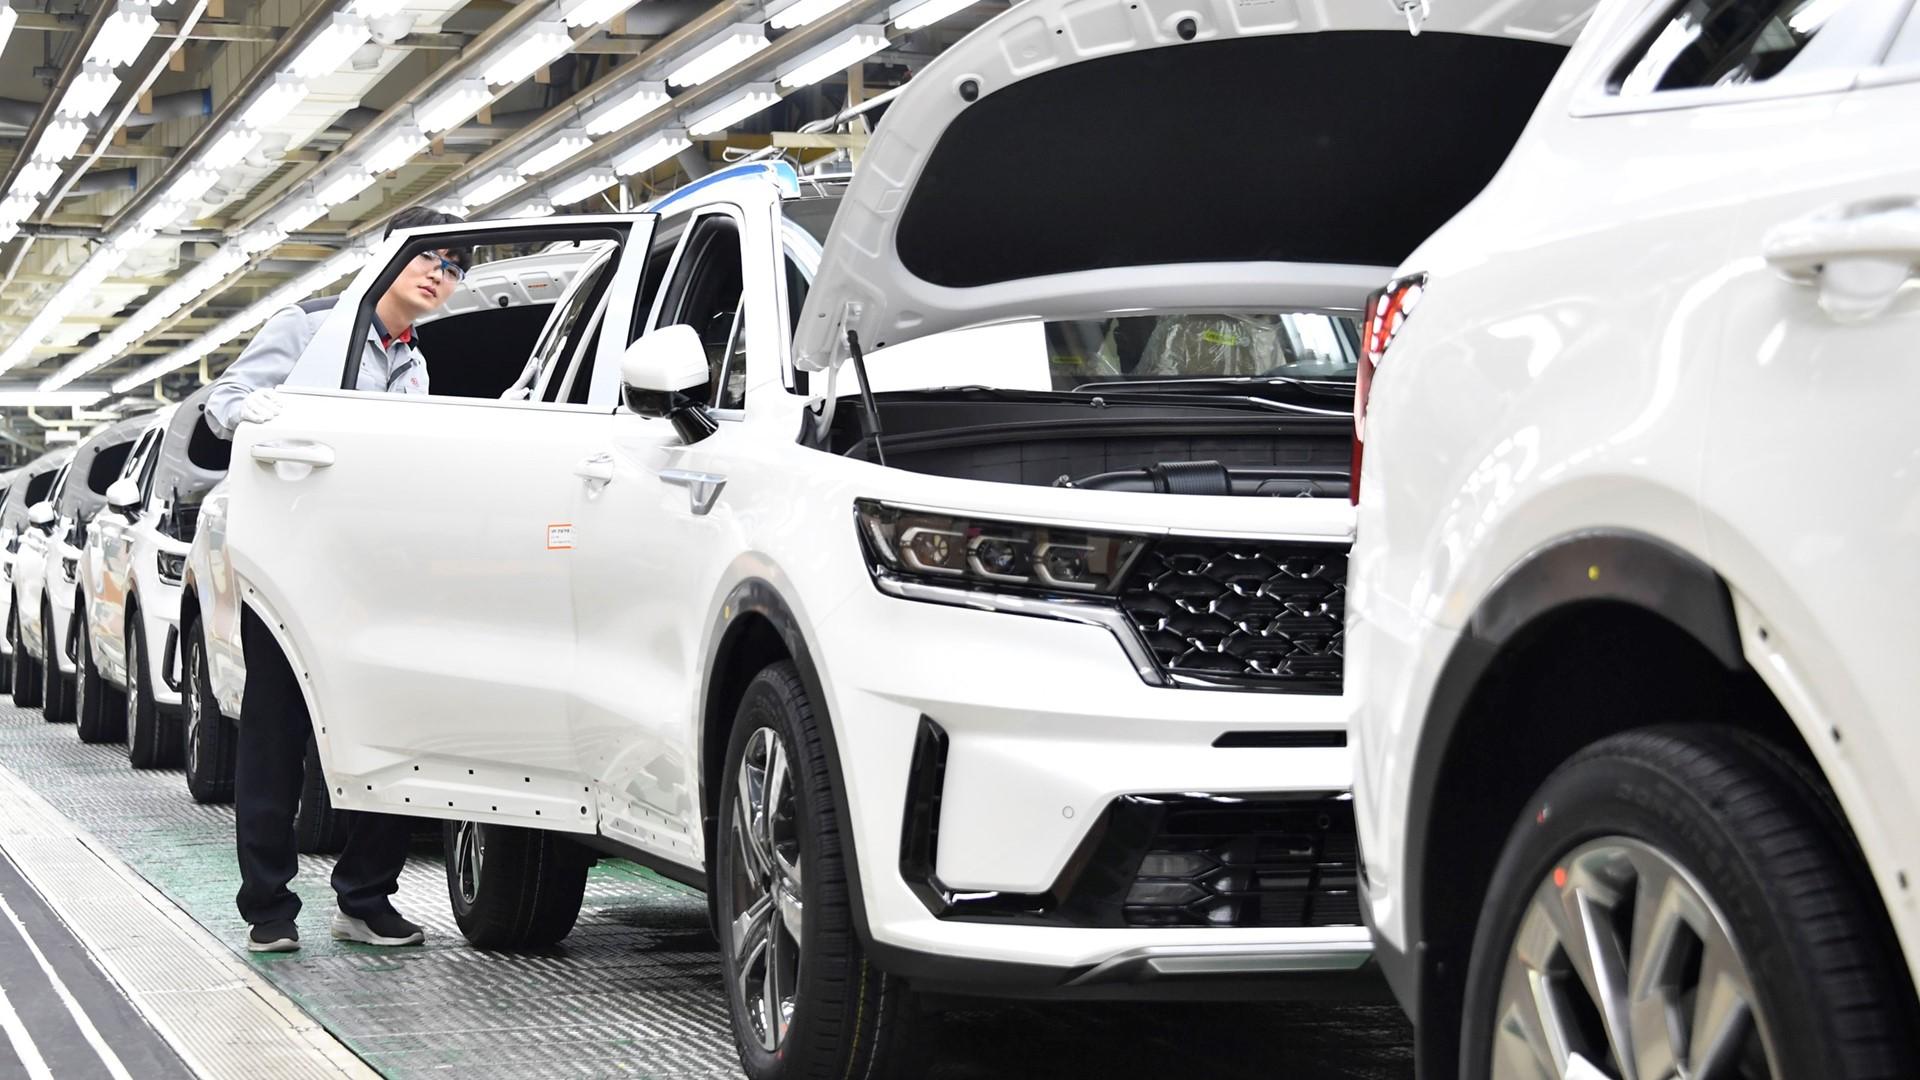 Start of production for new Kia Sorento Hybrid - Image 4